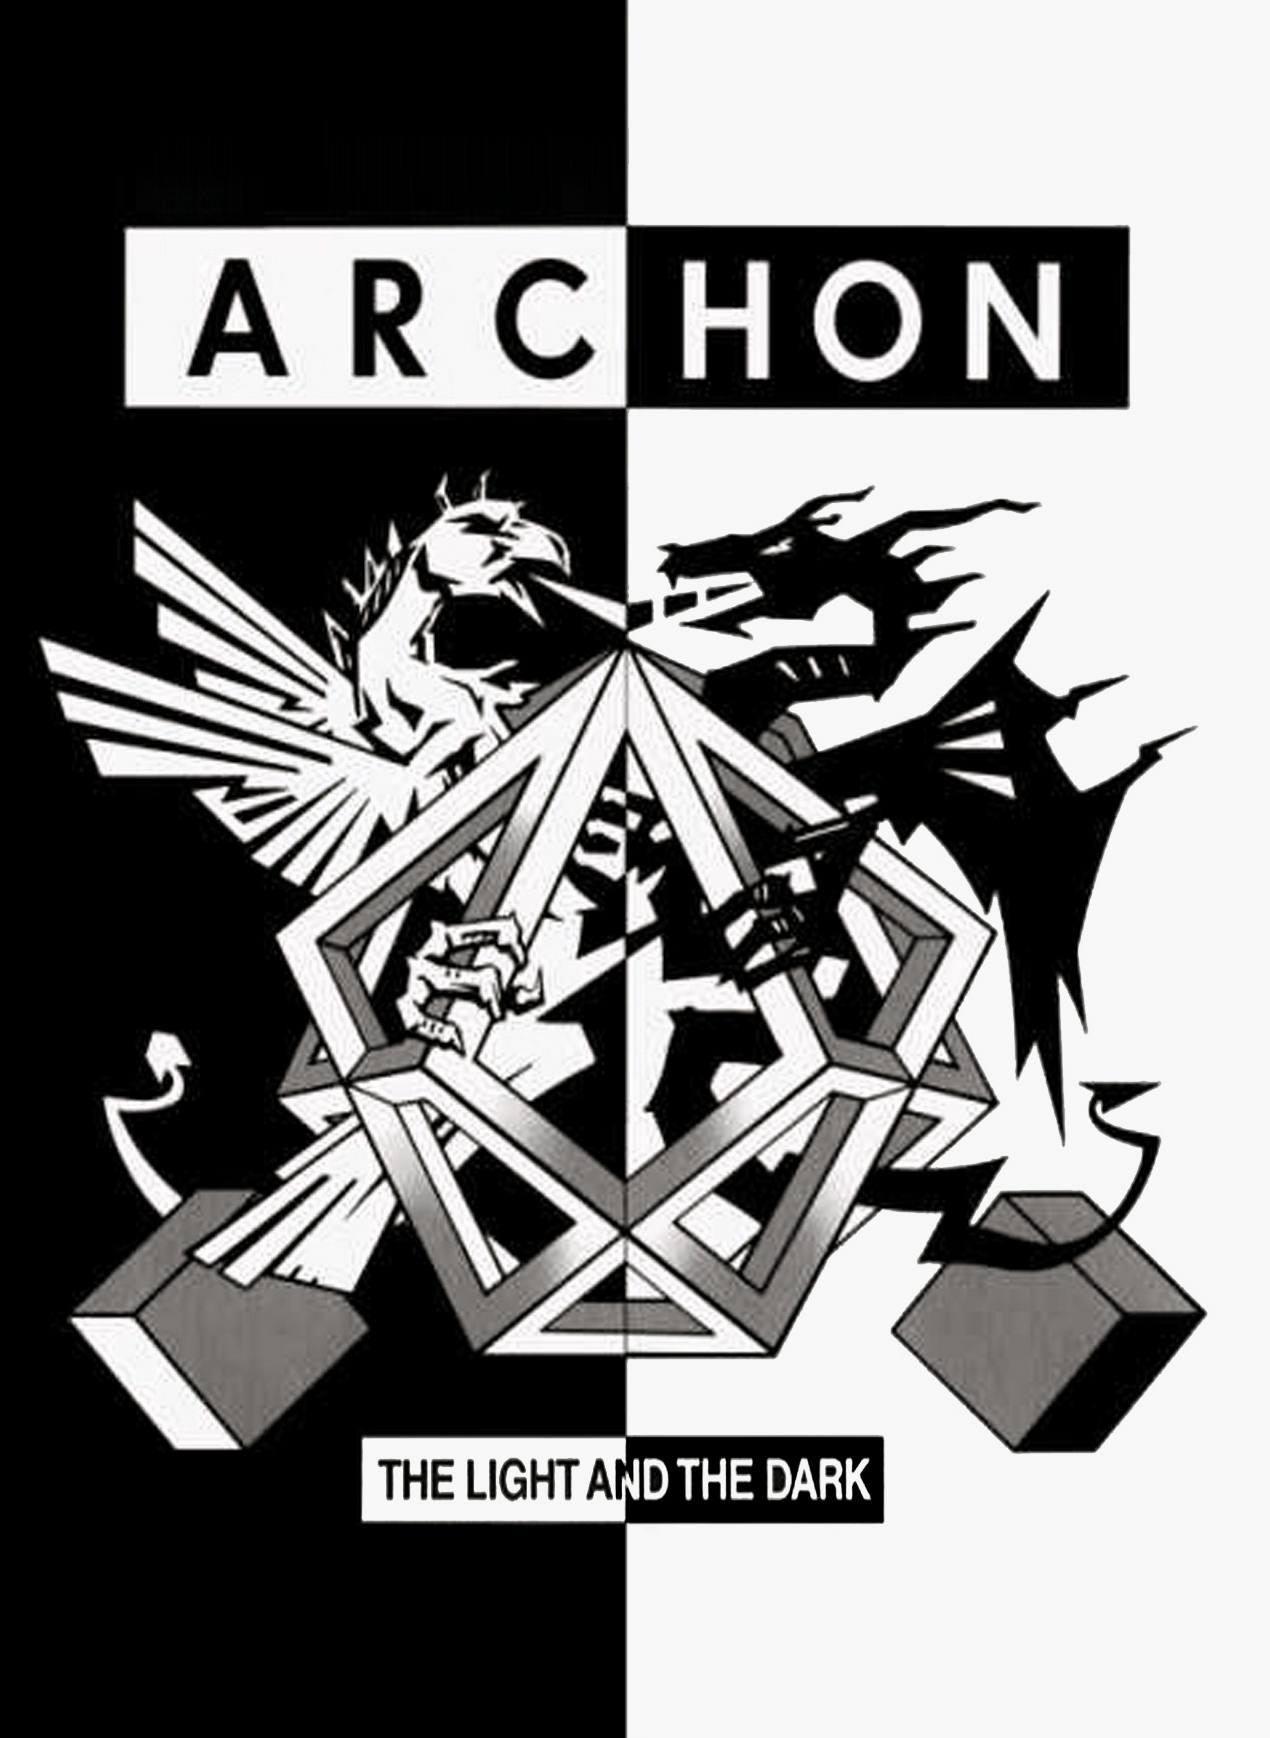 Archon PC game logo art